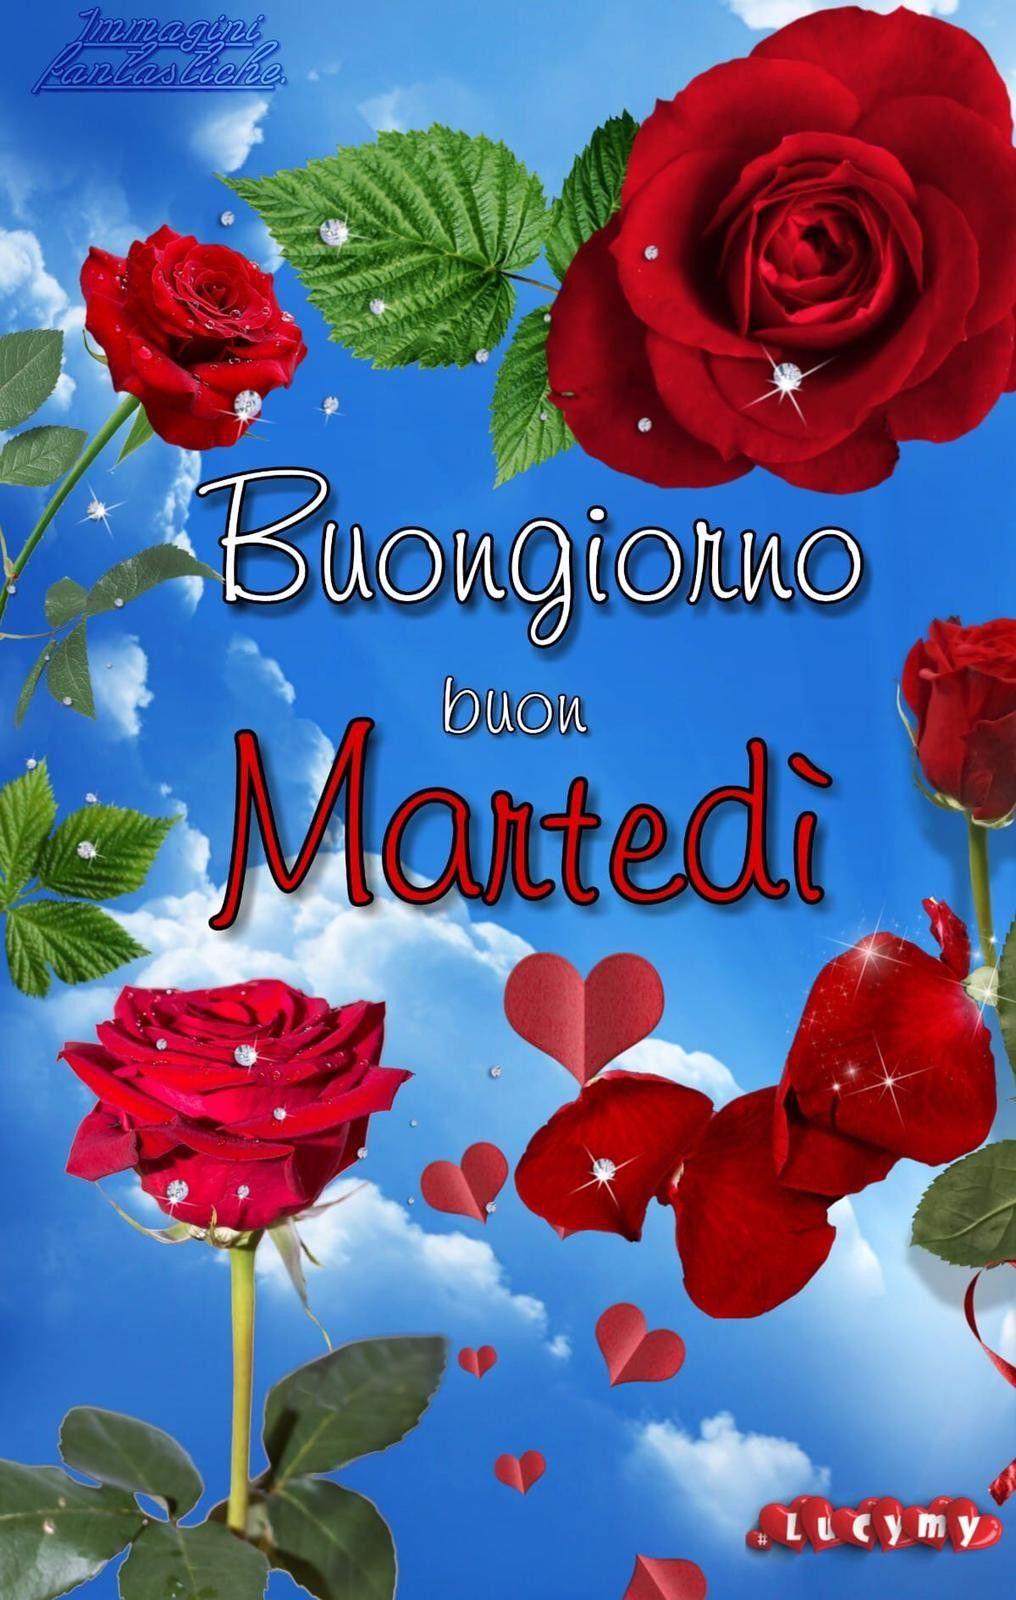 Pin di Nathalie Agushi su Italy bongorno Buongiorno